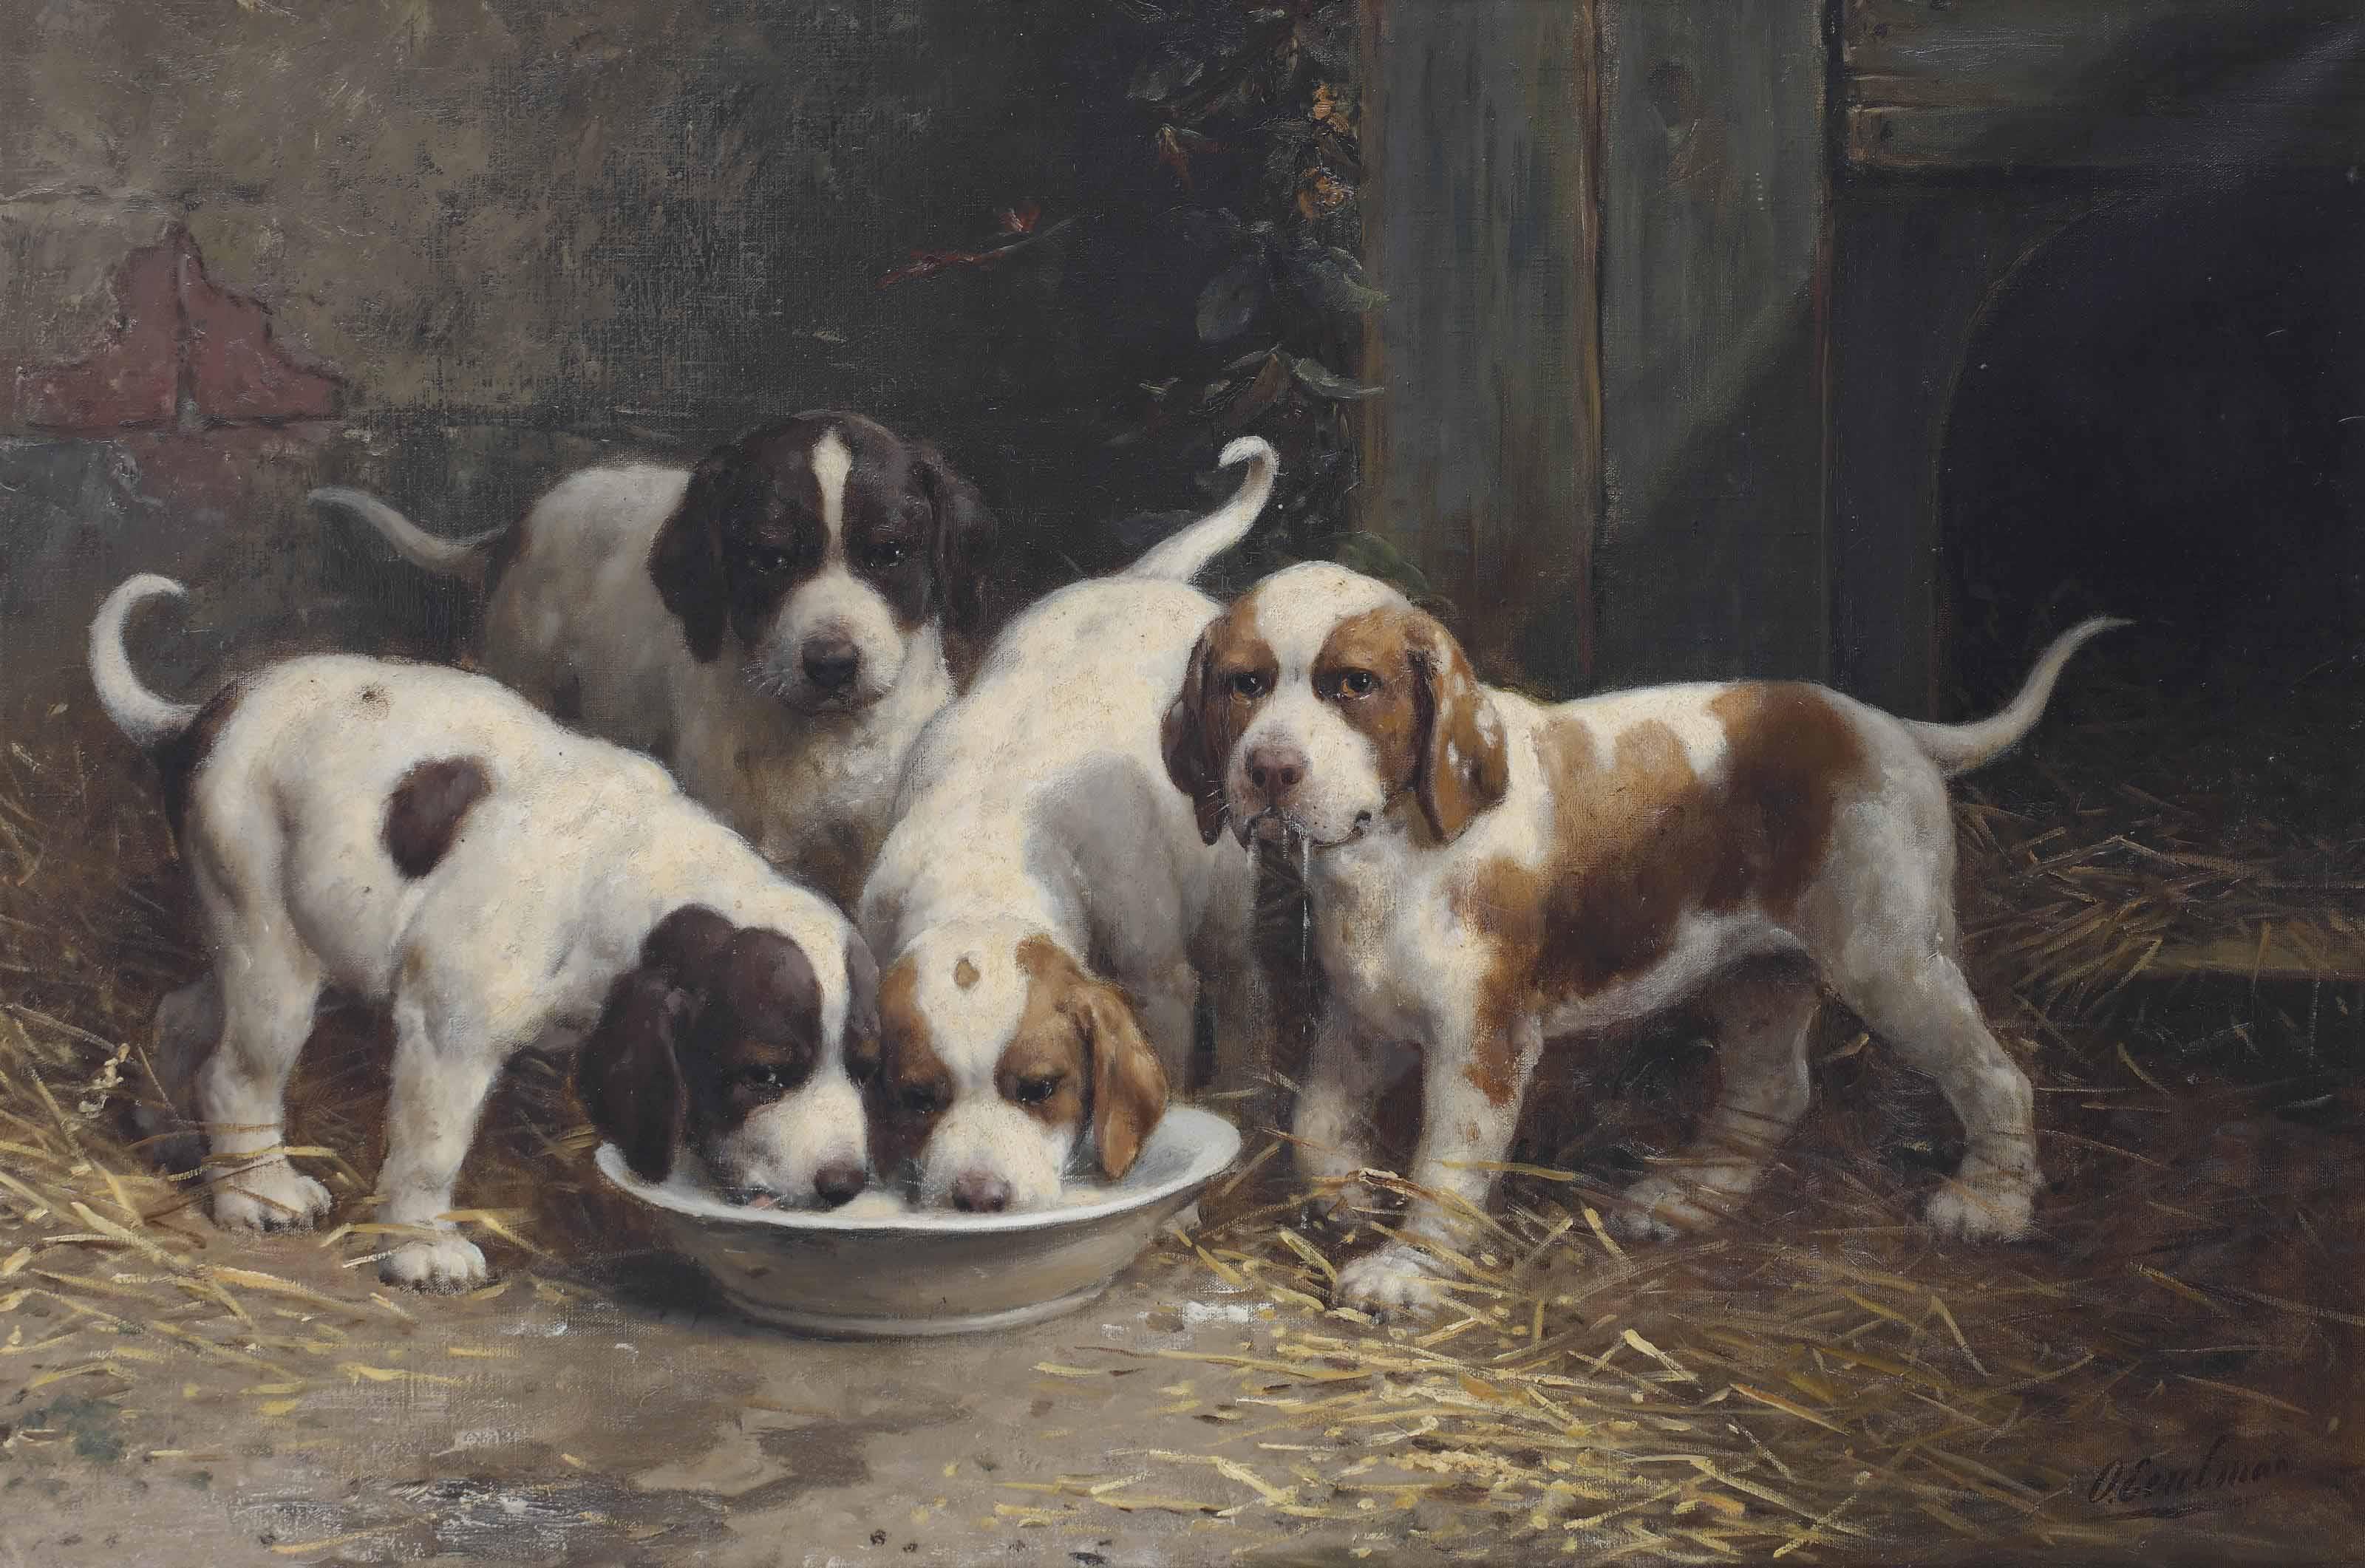 Saint Bernard puppies drinking milk